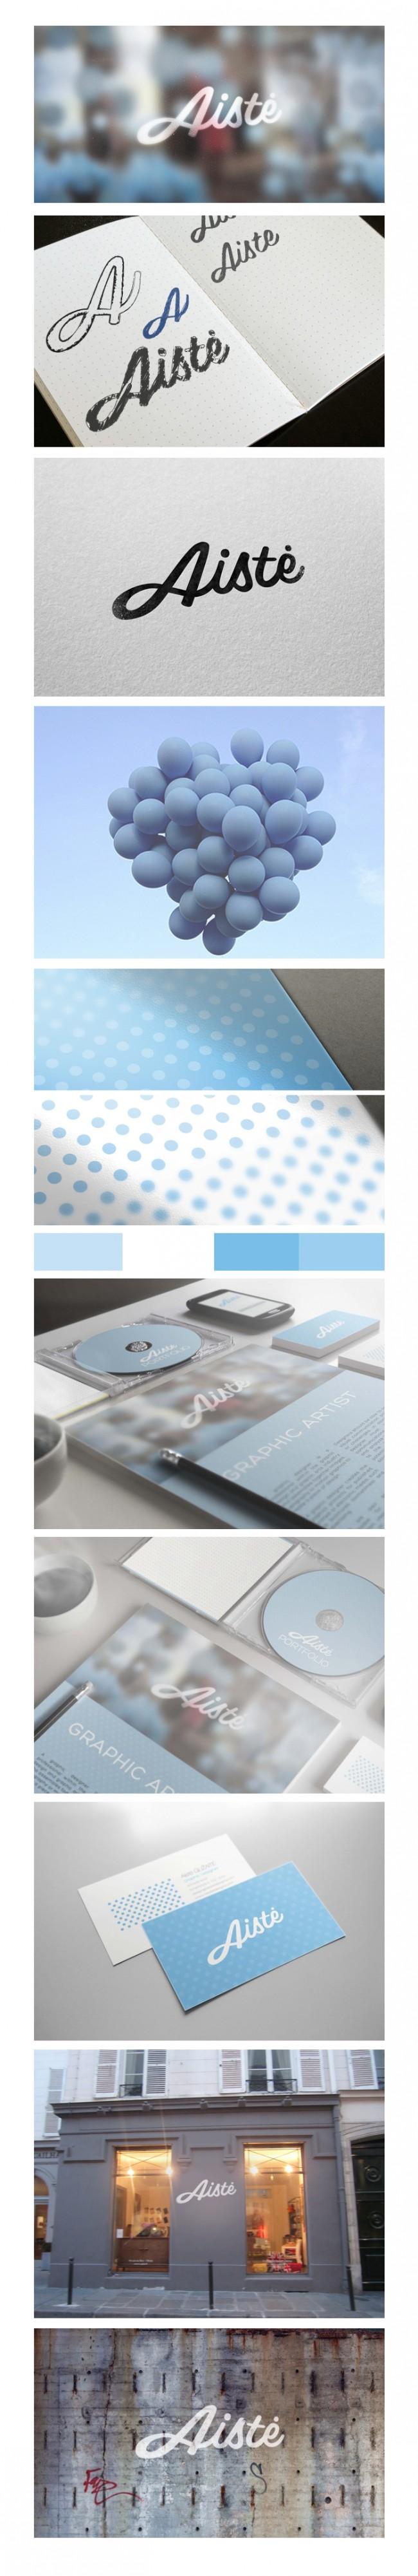 aiste branding 650x4001 Aiste Branding